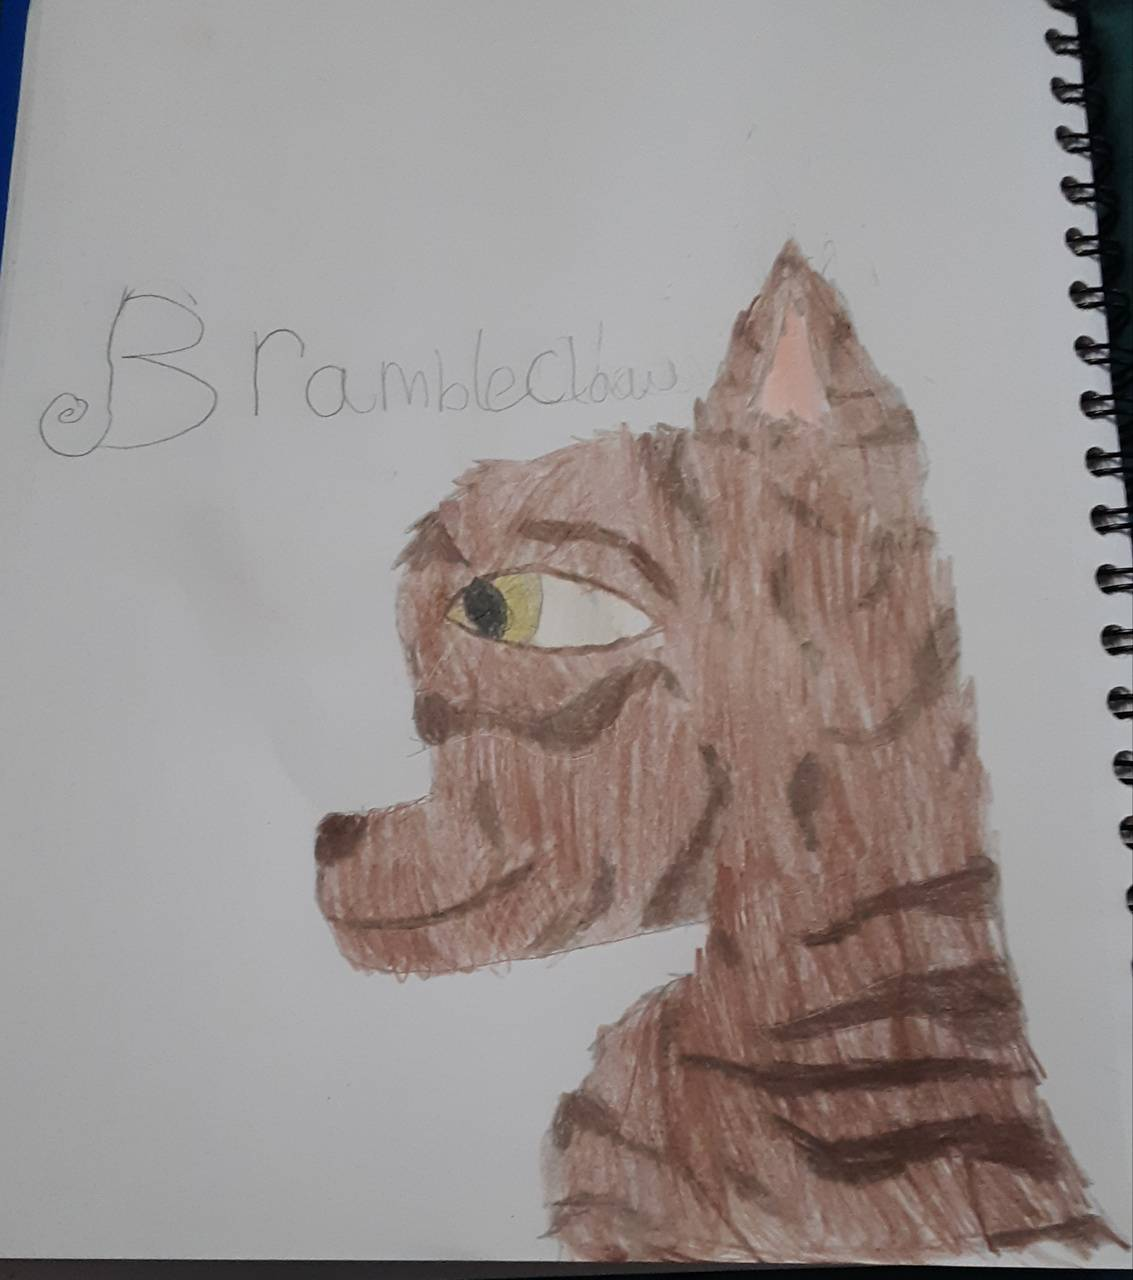 Brambleclaw